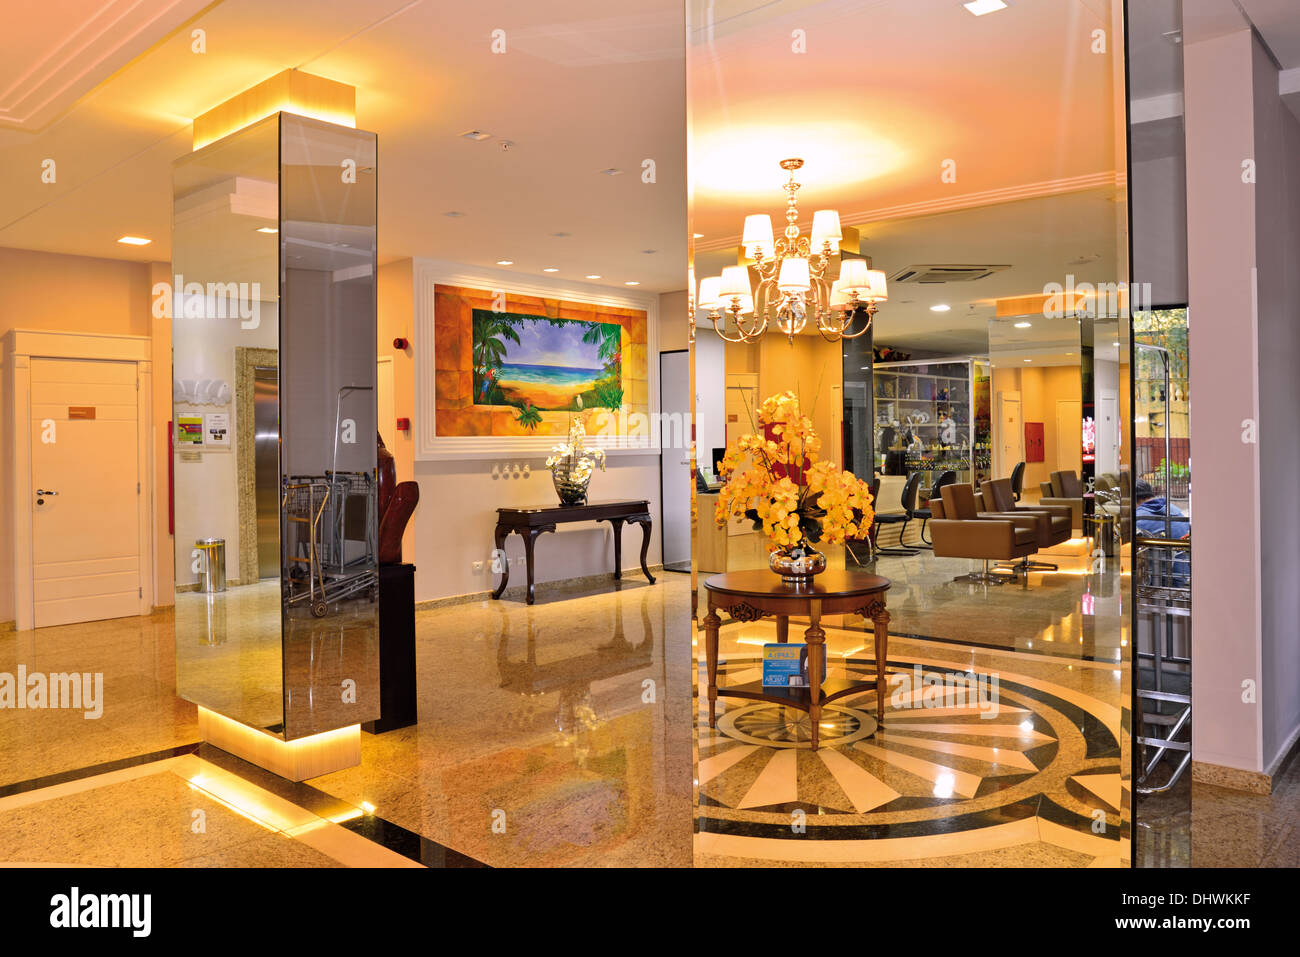 Brazil, Foz do Iguaçu: Elegant entrance hall in the Hotel Tarobá - Stock Image